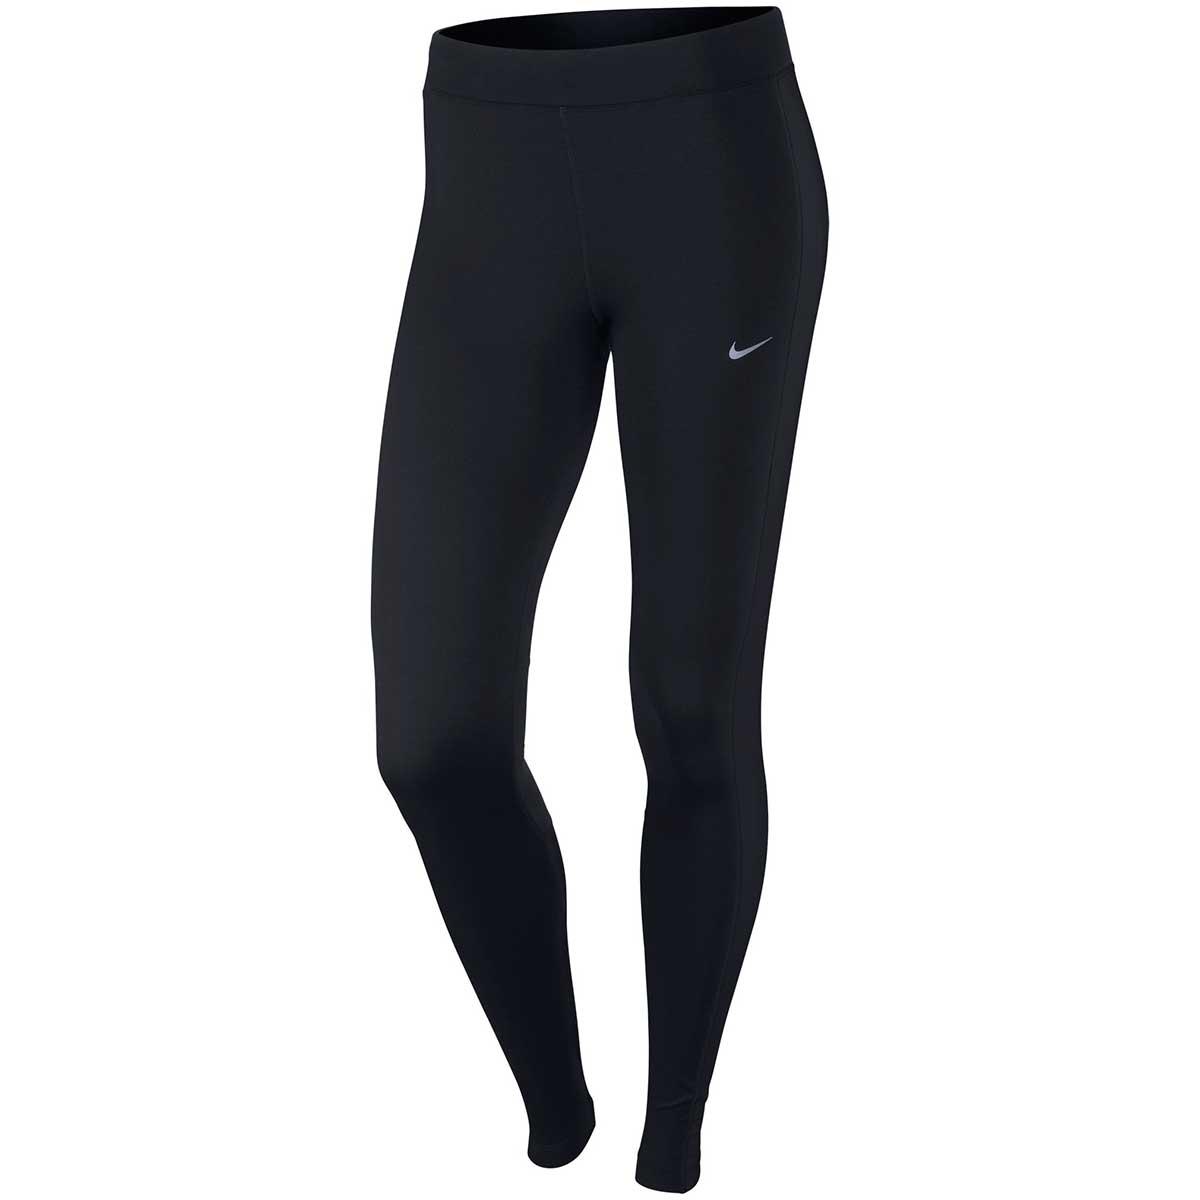 Women's Sportswear, Clothing, Buy, Nike, Nike Womens Power Essential Running  Tight (Black) , , ,